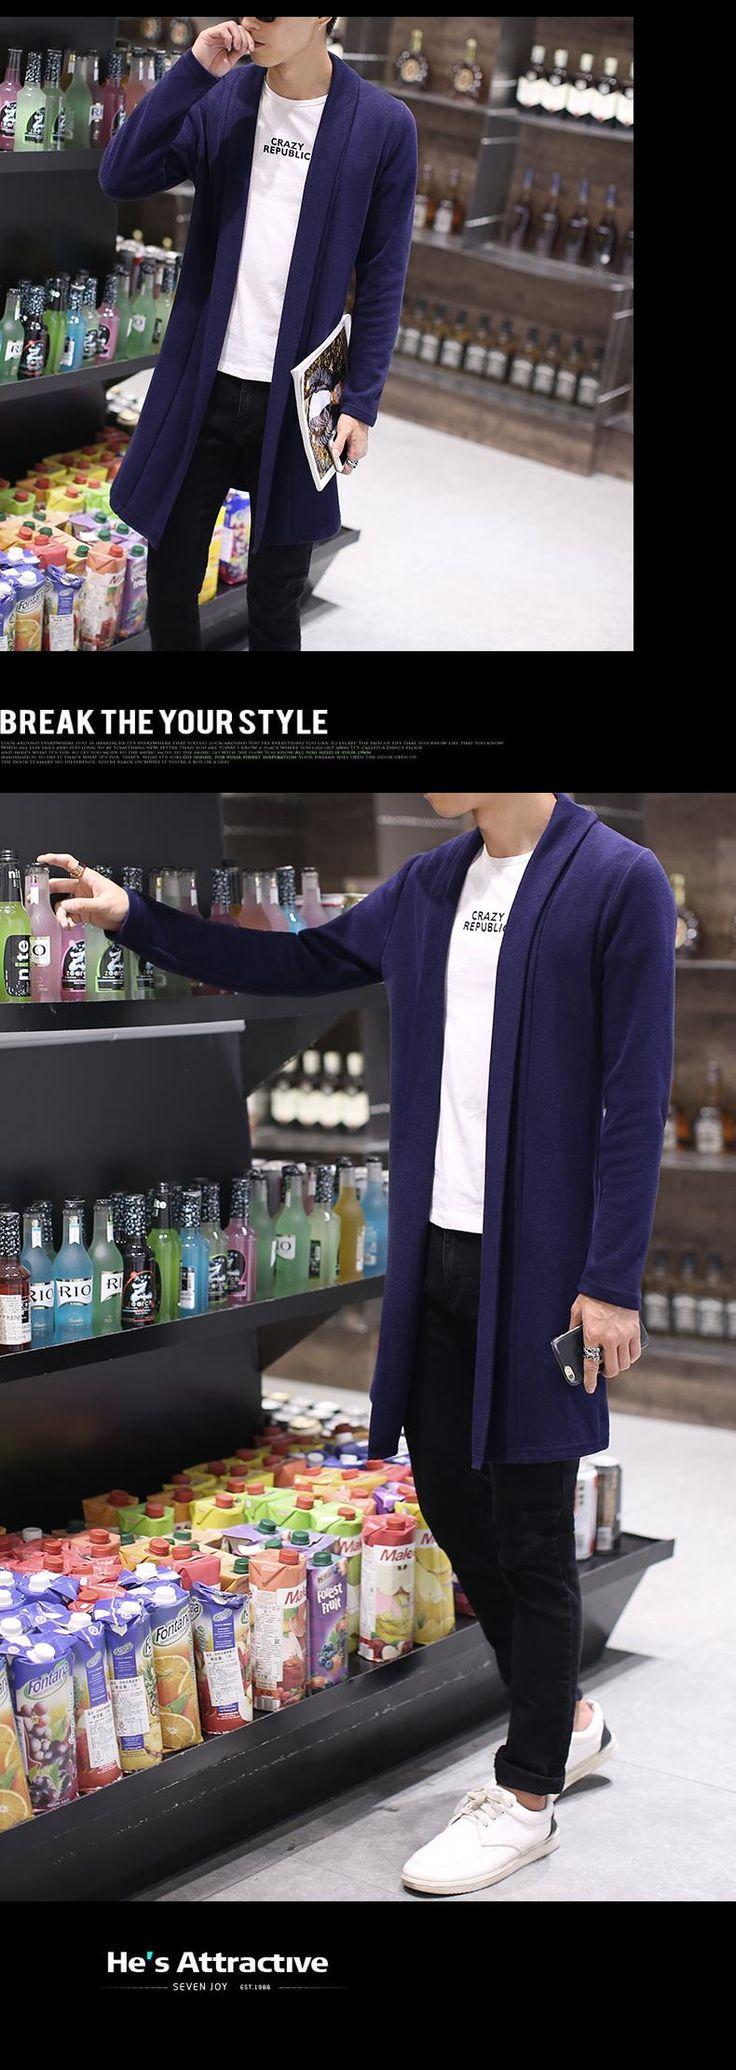 Chompas пункт hombre 2016 бренд одежда осень свитер моды для мужчин slim fit…